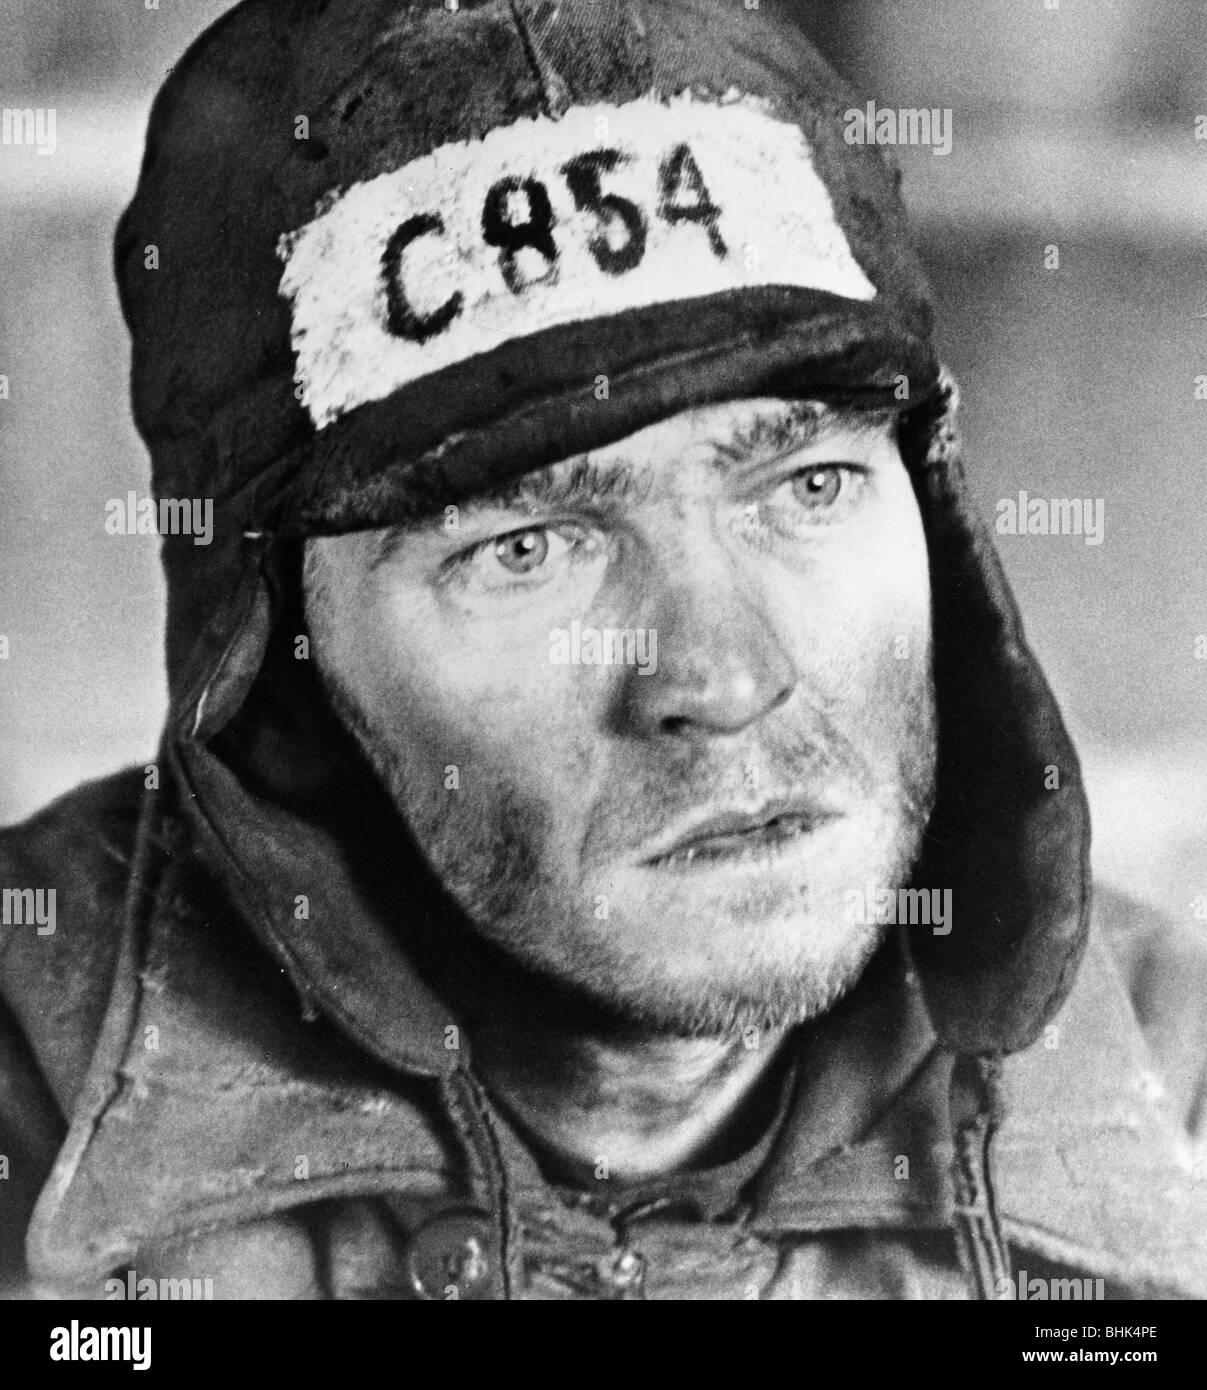 Tom Courtenay (1937- ), British actor, 1972. - Stock Image